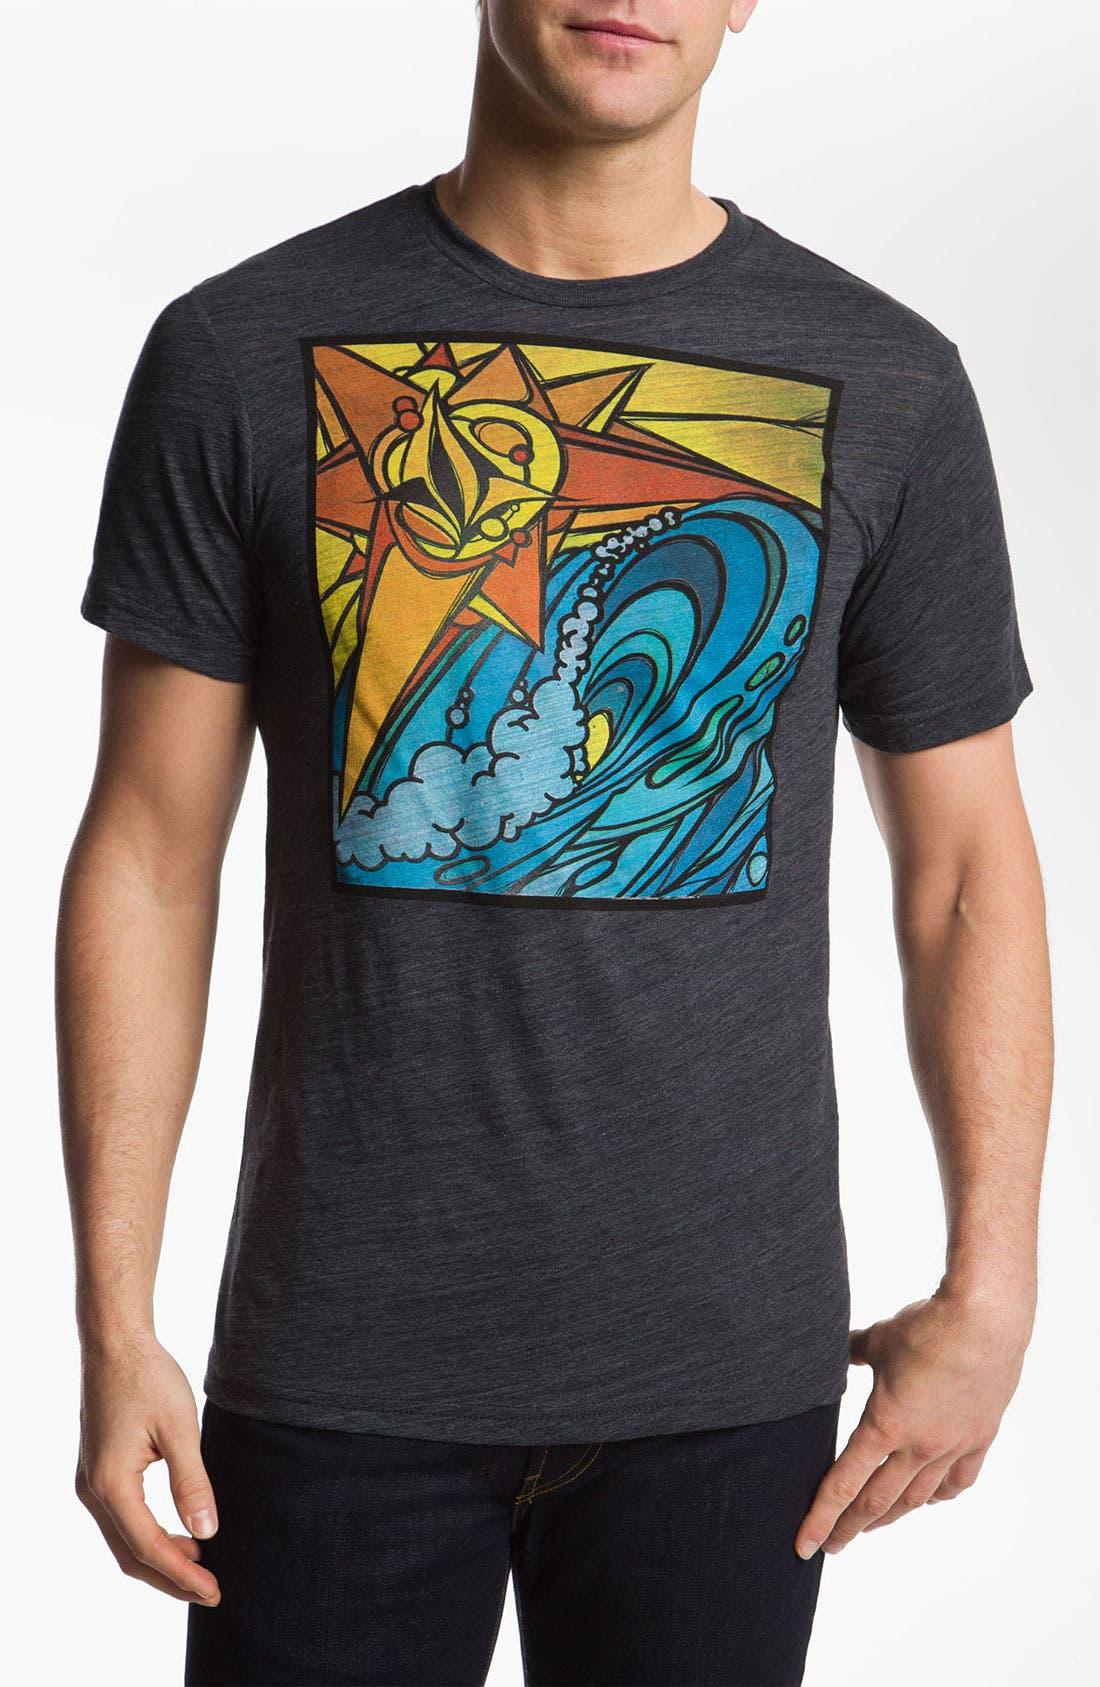 Alternate Image 1 Selected - Volcom 'St. Bart's Mural' Graphic T-Shirt